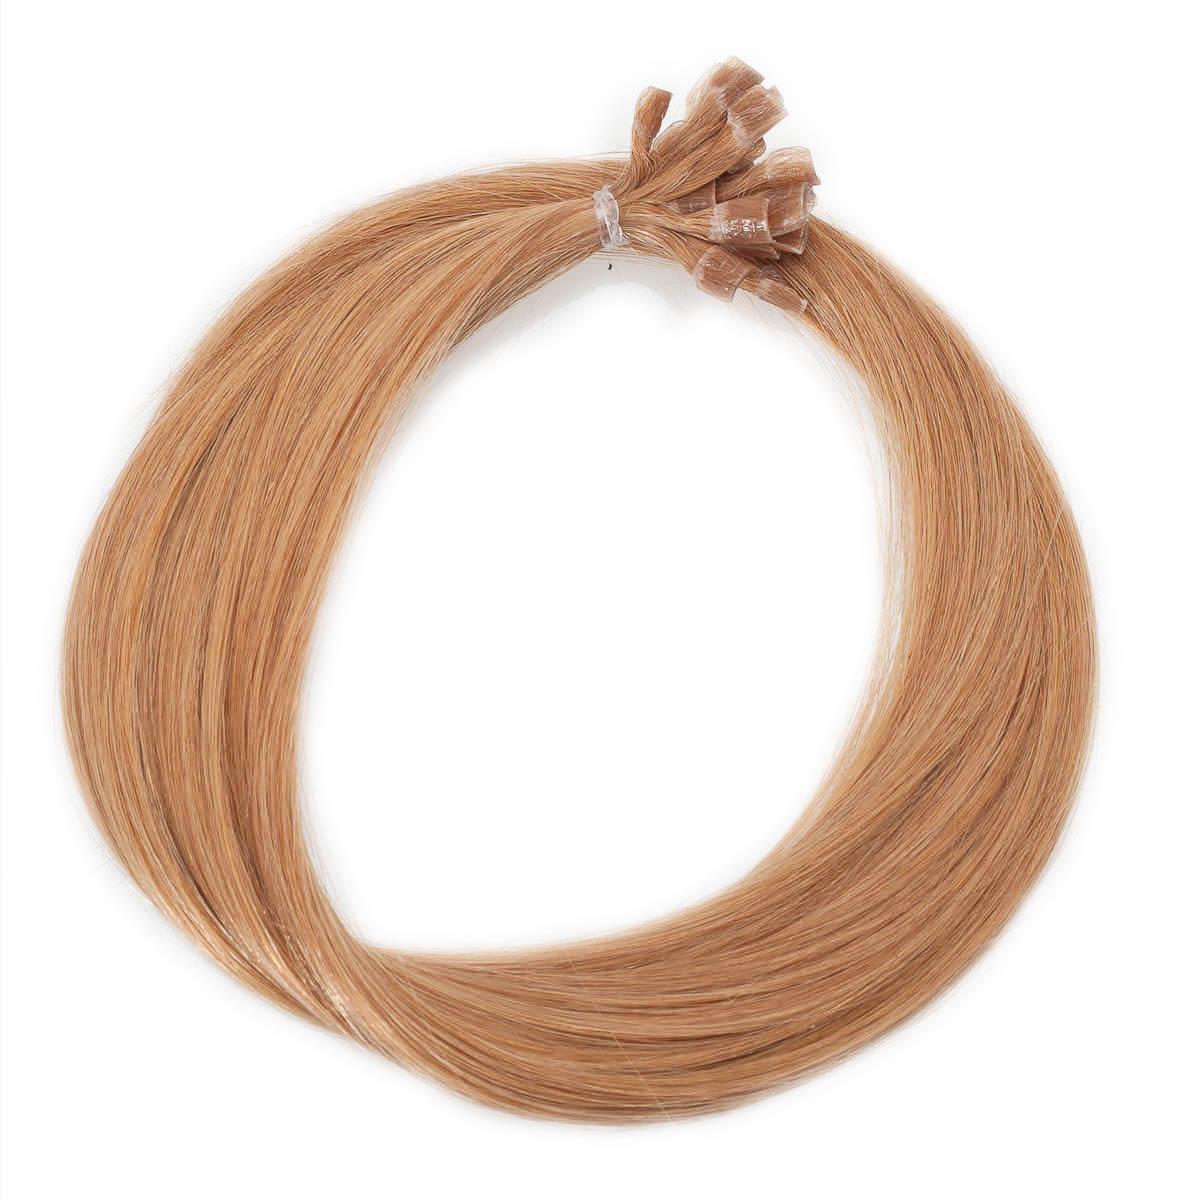 Nail Hair Original 7.4 Medium Golden Blonde 60 cm